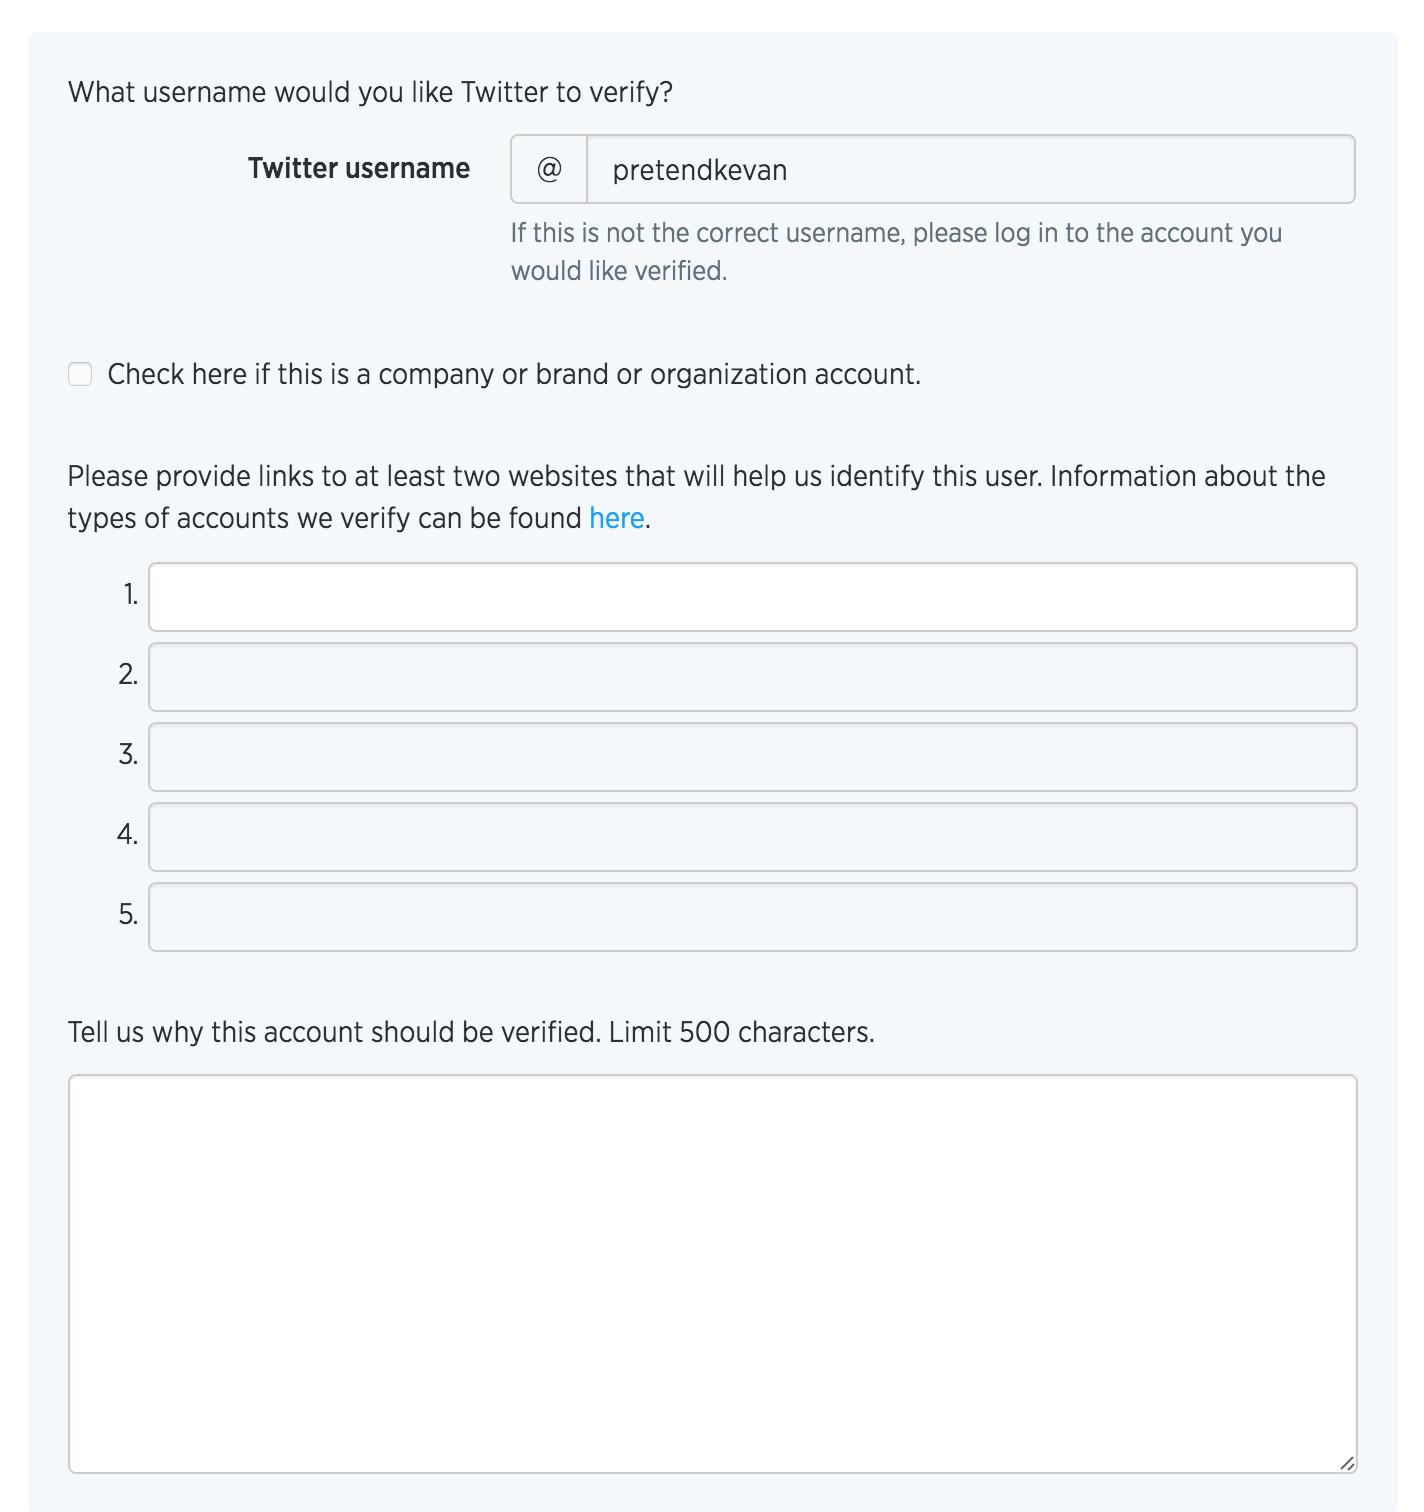 request-Twitter-verificaton-form-fields.png